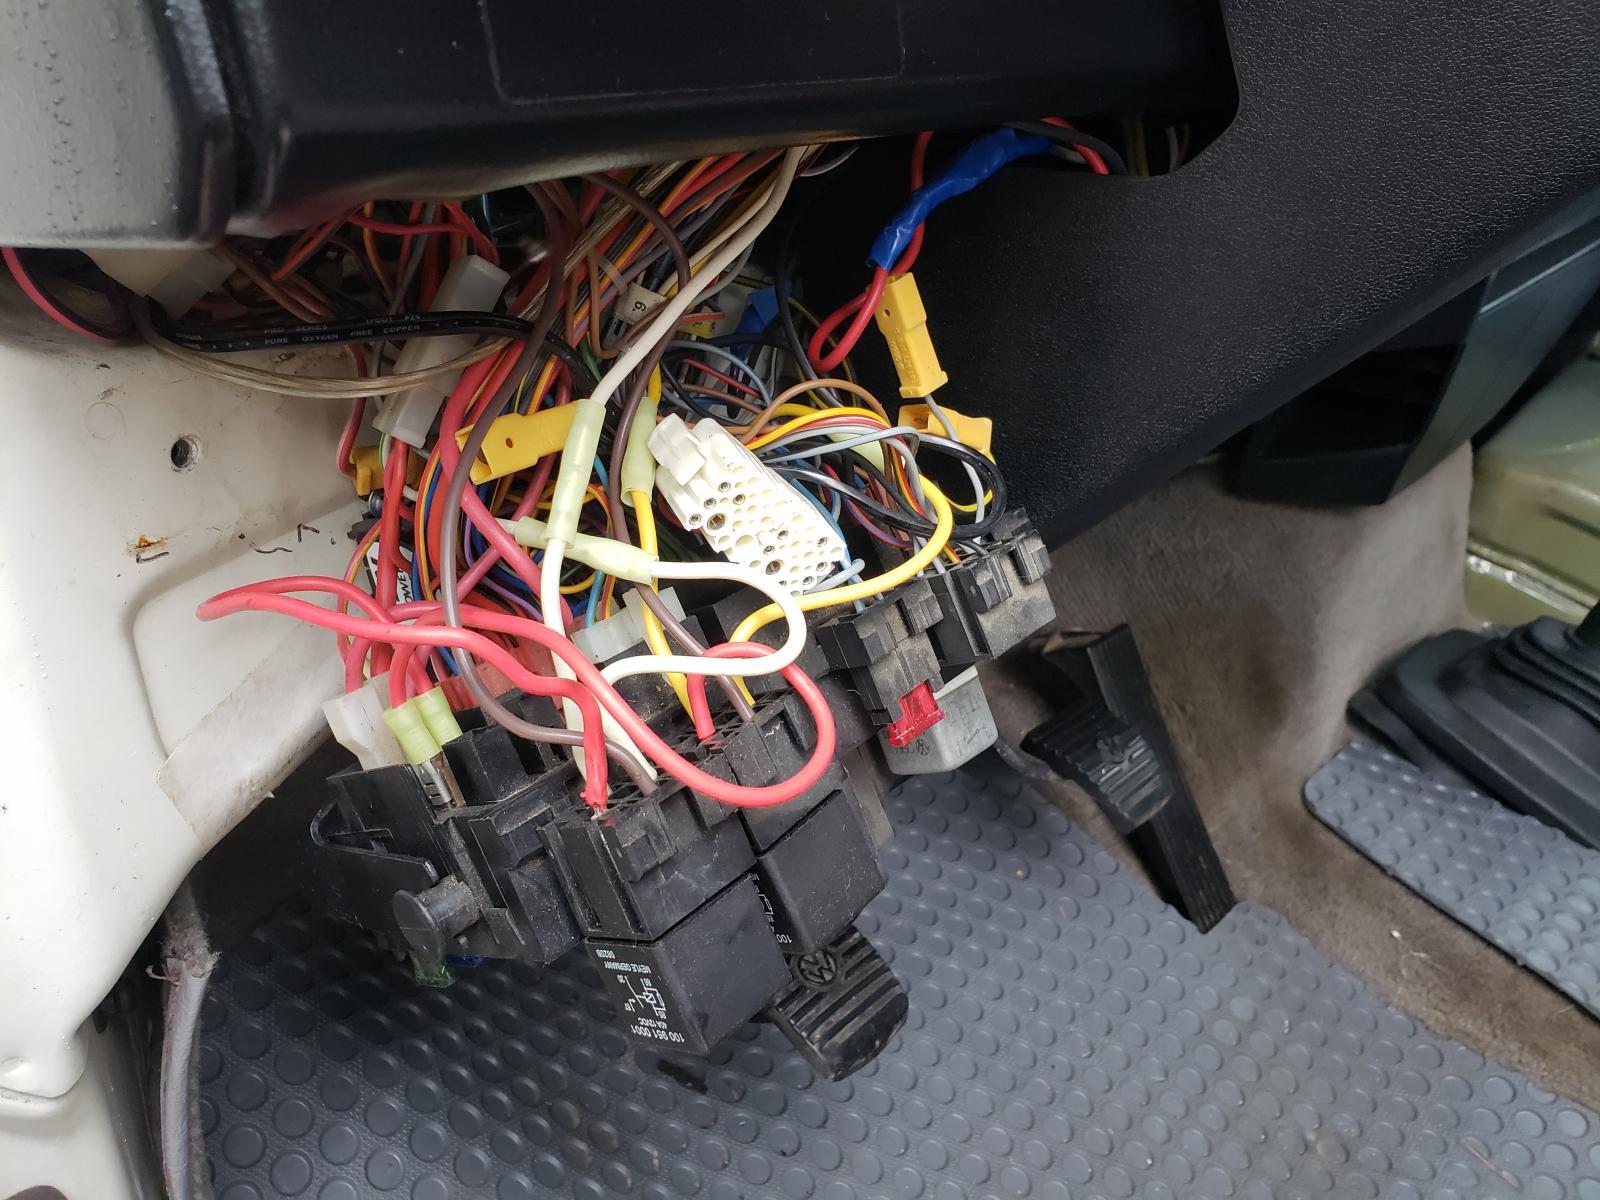 D15 plug location